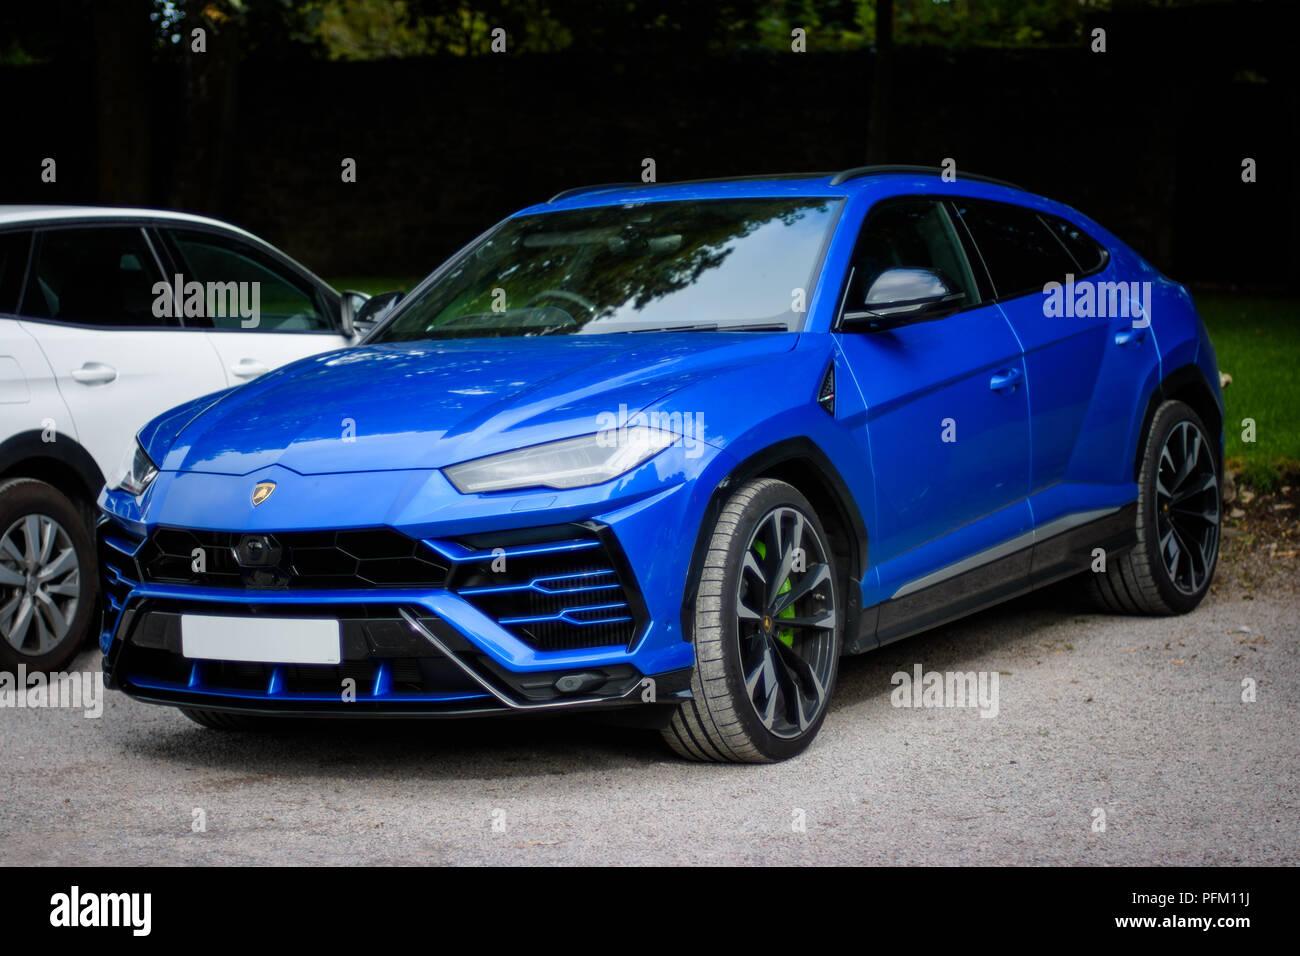 Cardiff Wales Uk August 19 2018 Blue Lamborghini Urus Stock